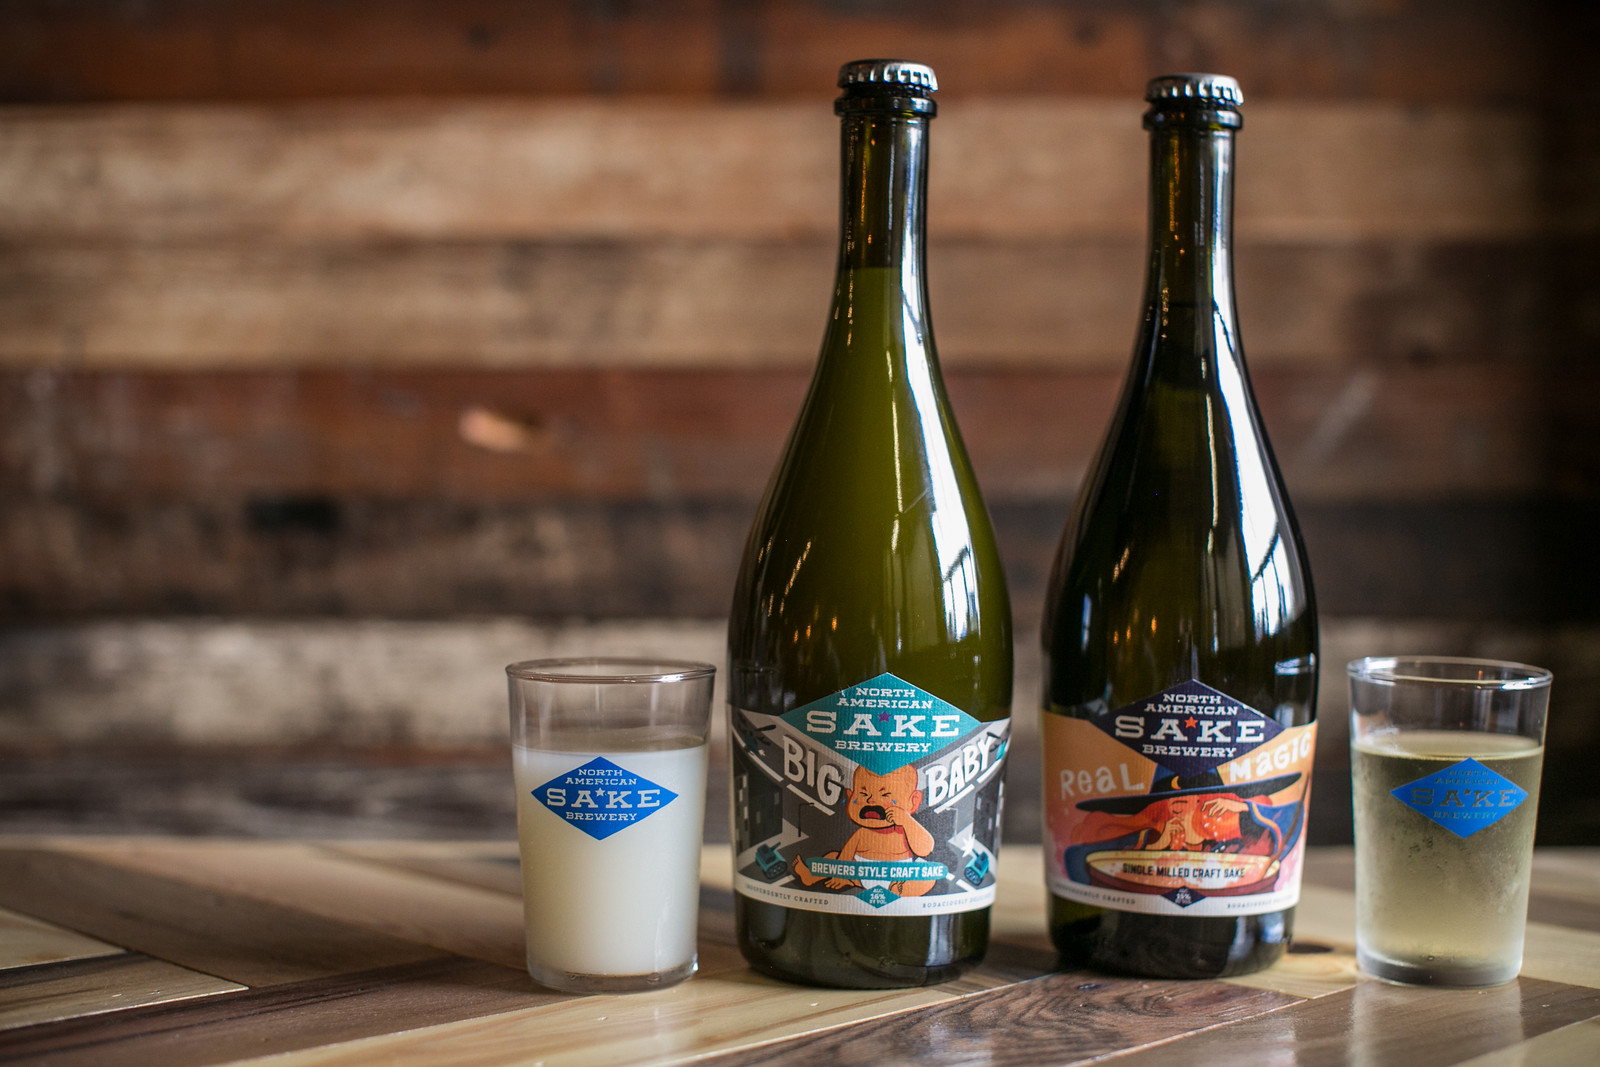 North American Sake